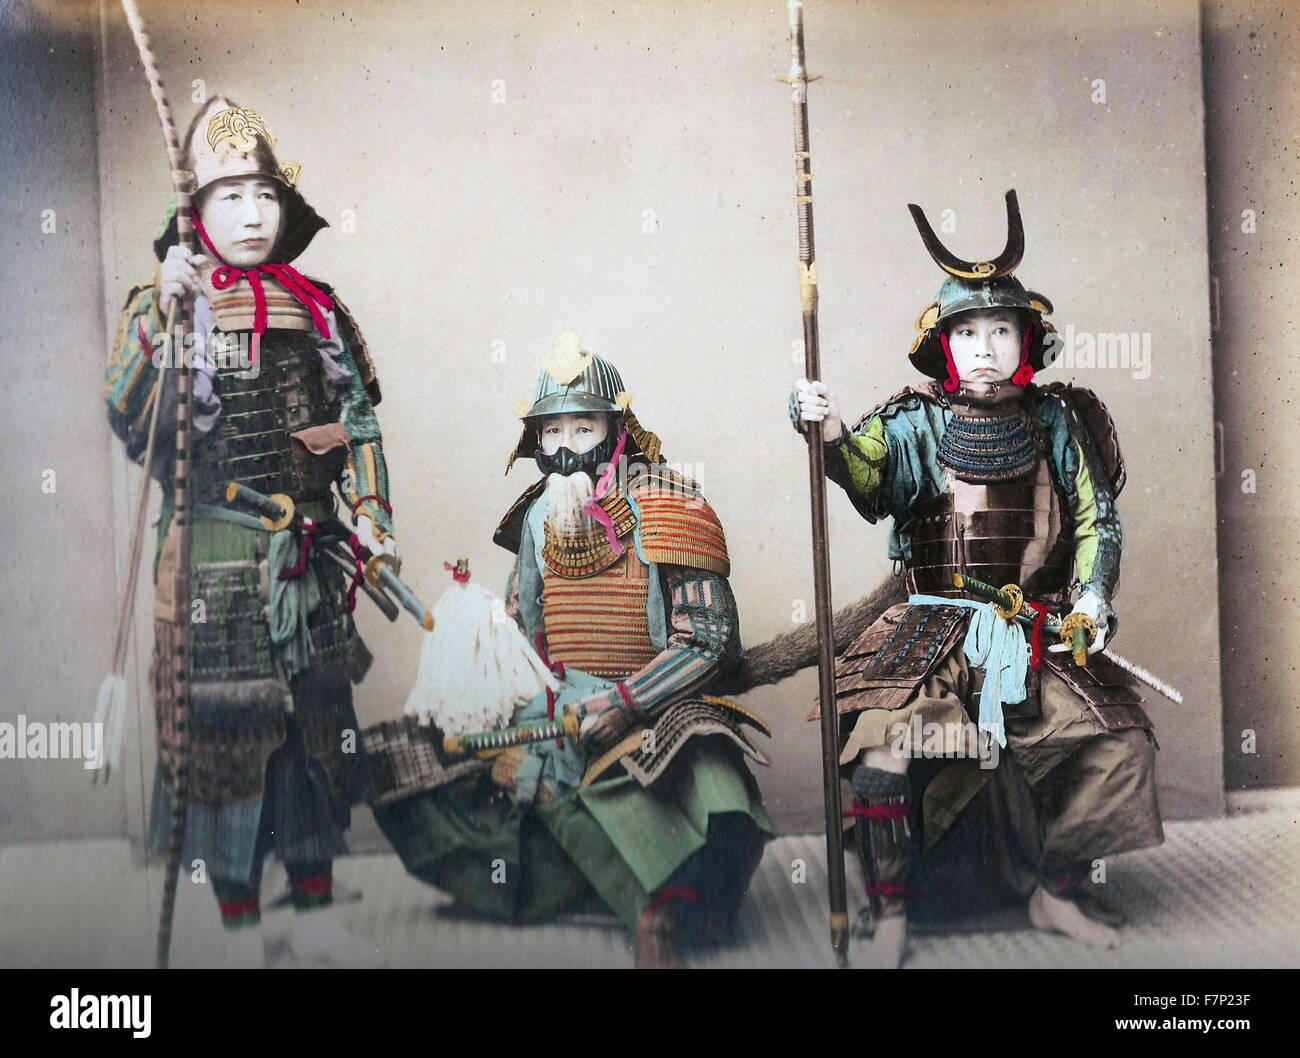 japanische samurai krieger 1900 stockfoto bild 90839043